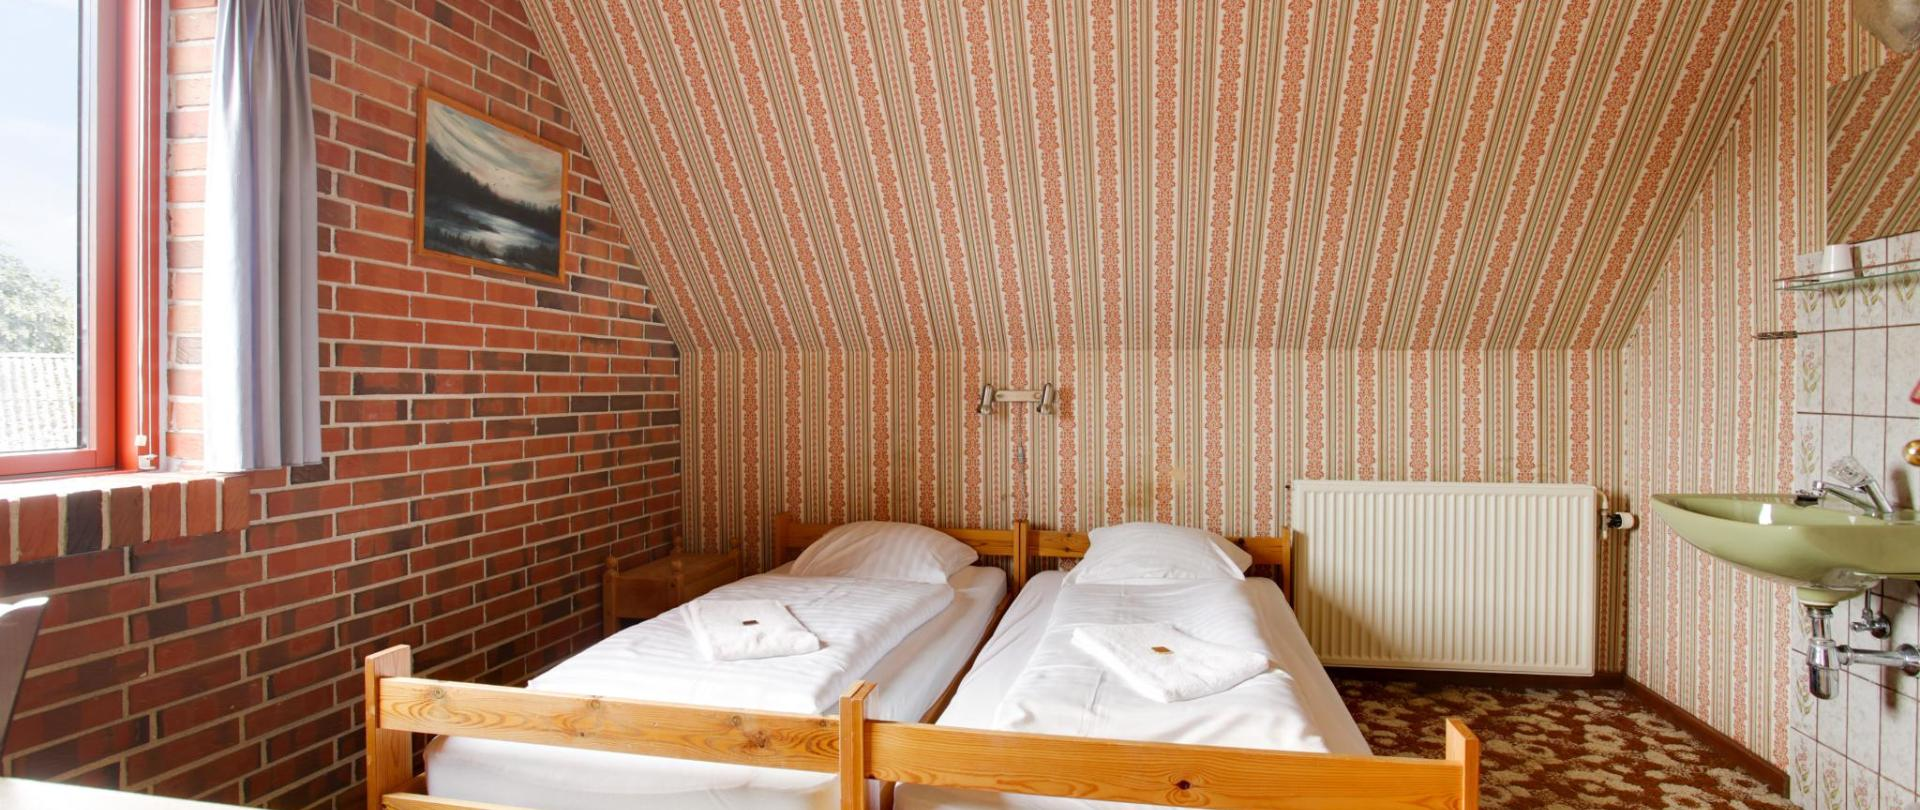 Hotel Simested Kro